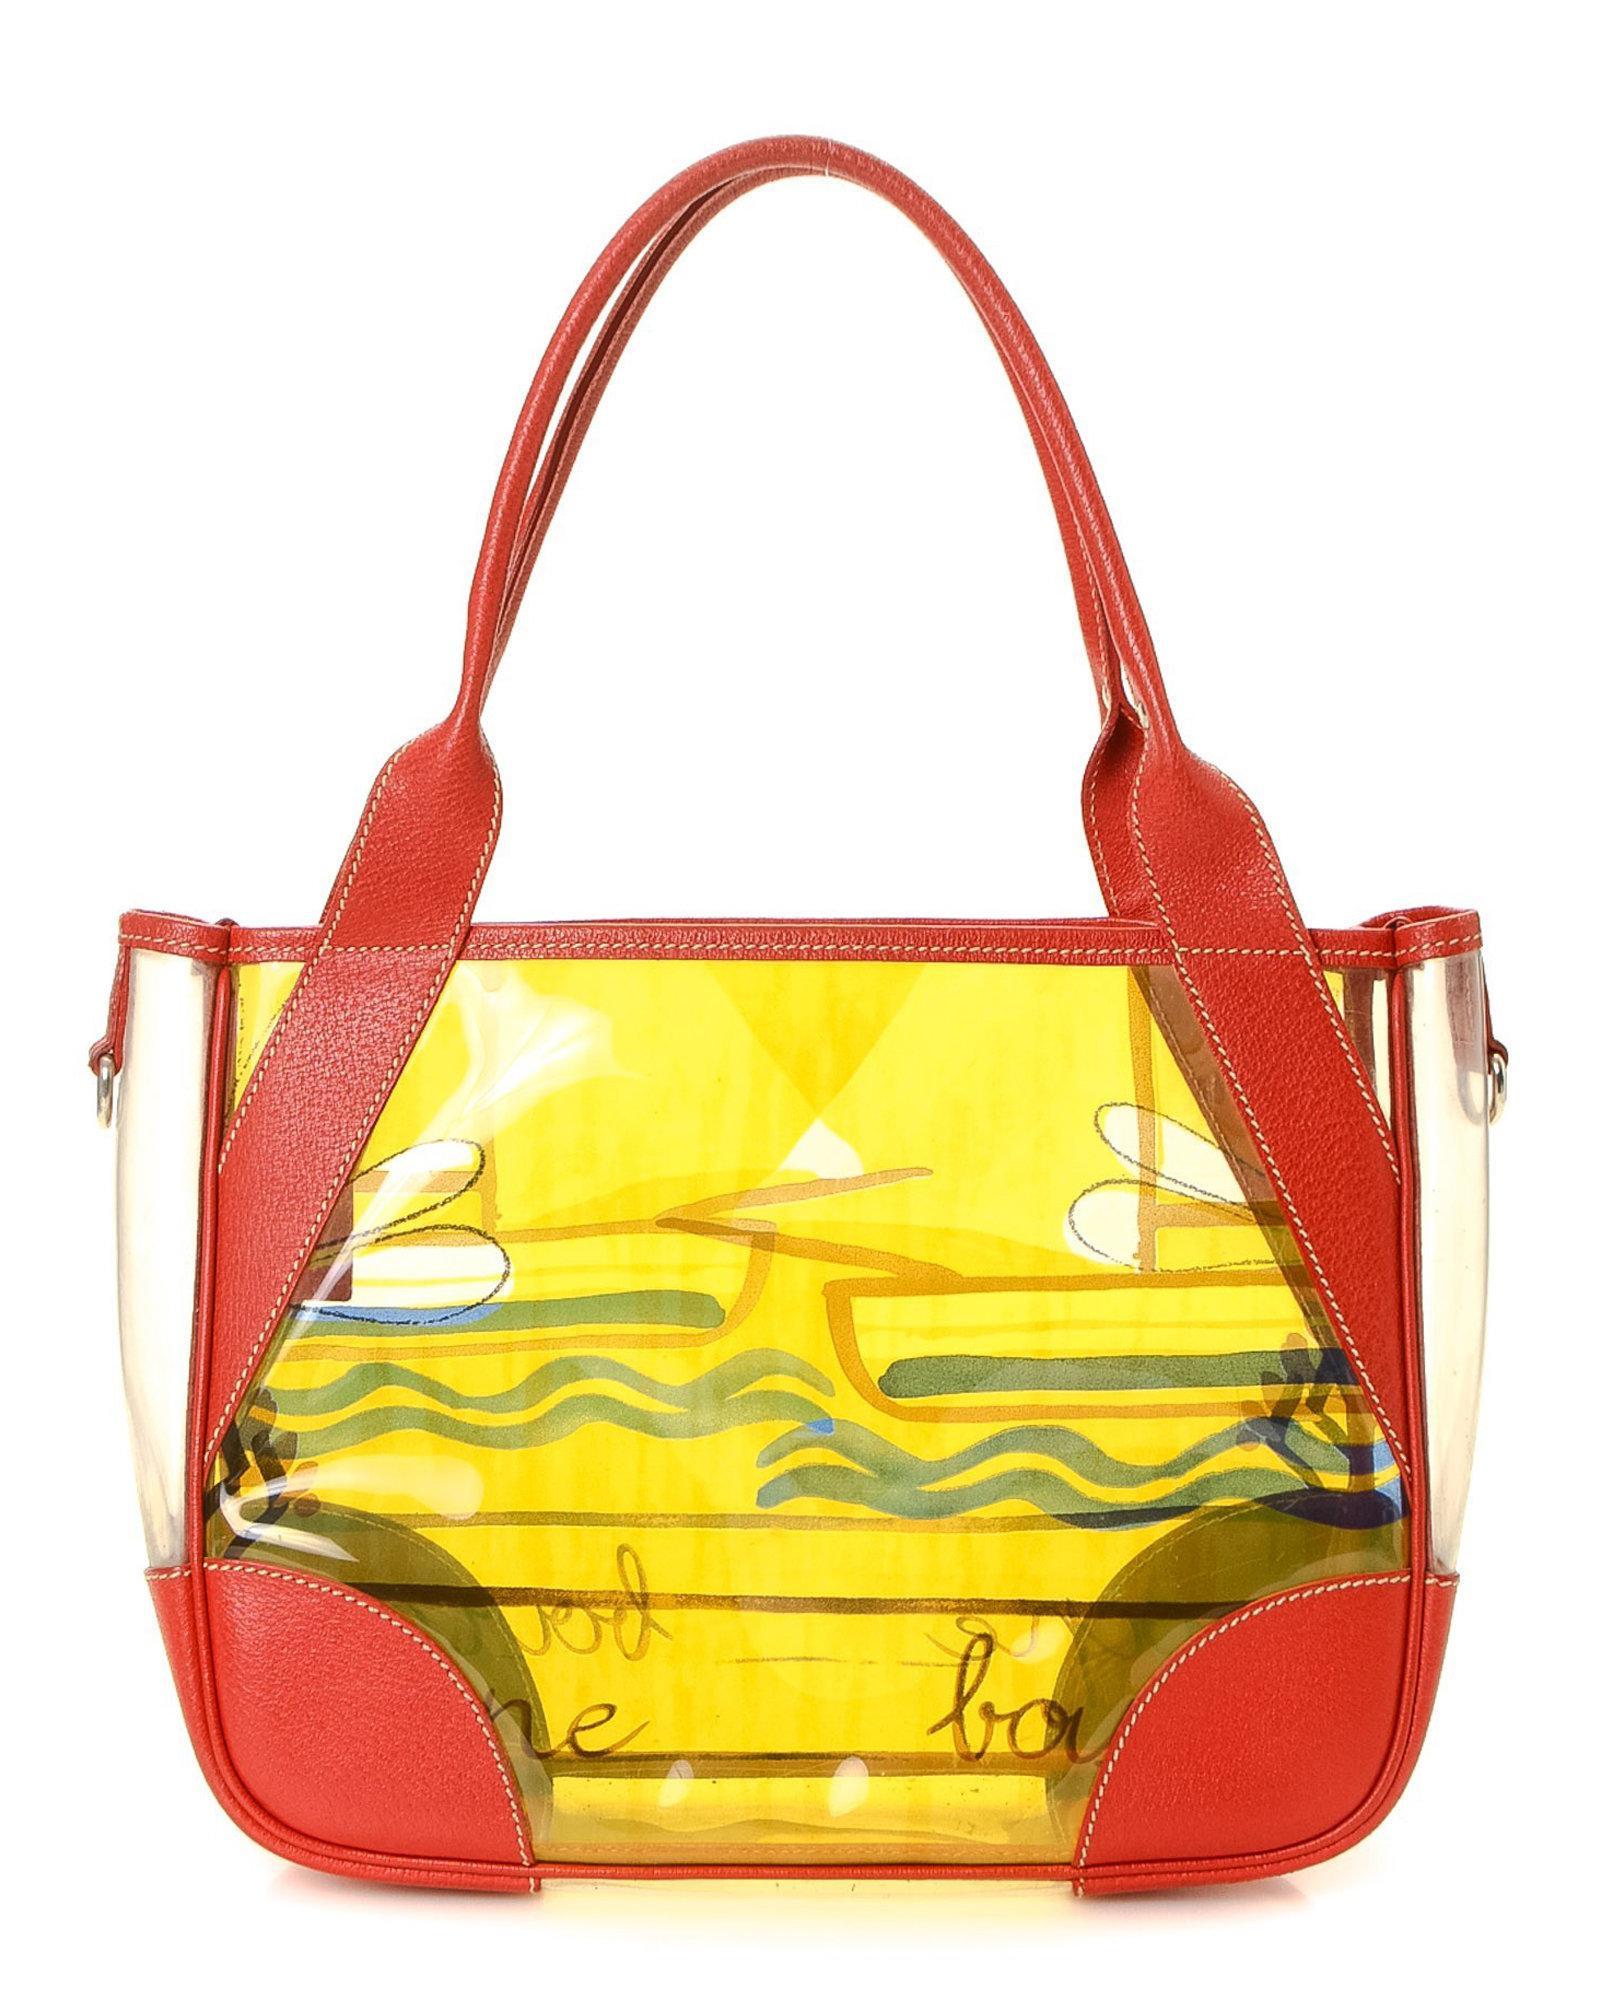 0dc2461a3320 Lyst - Prada Vinyl Beach Bag - Vintage